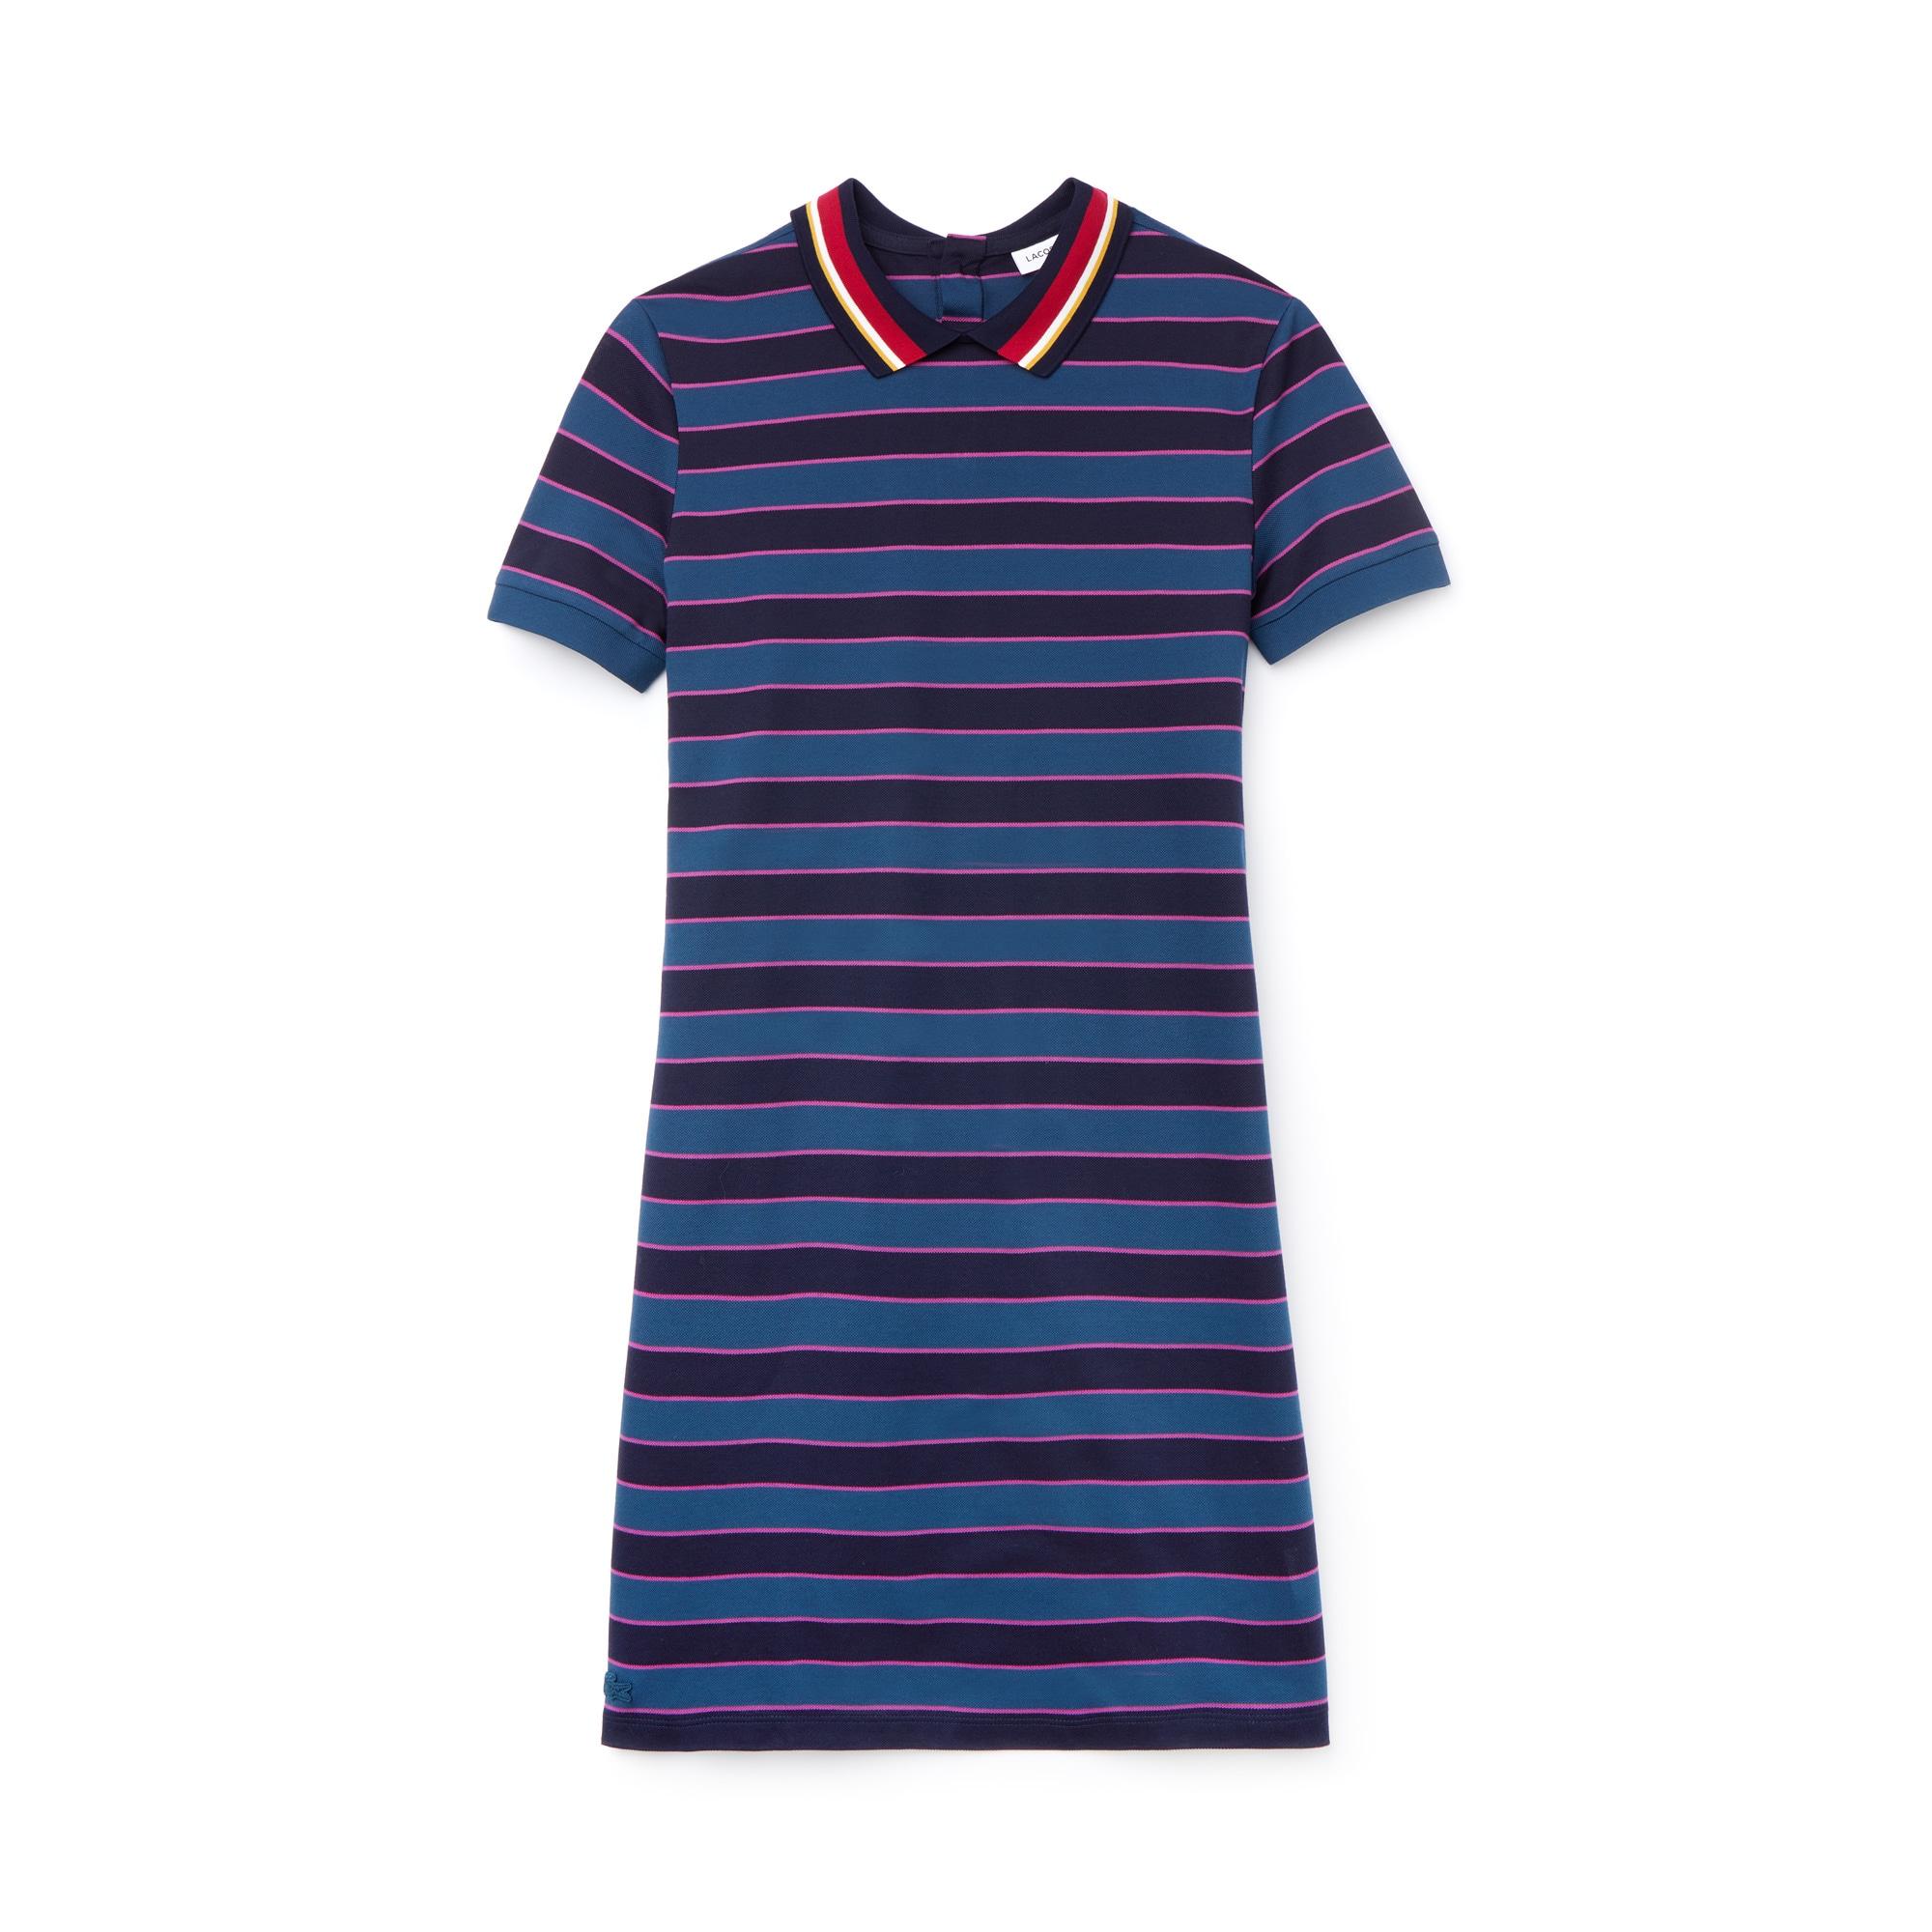 Women's Contrast Bands Striped Piqué Polo Dress